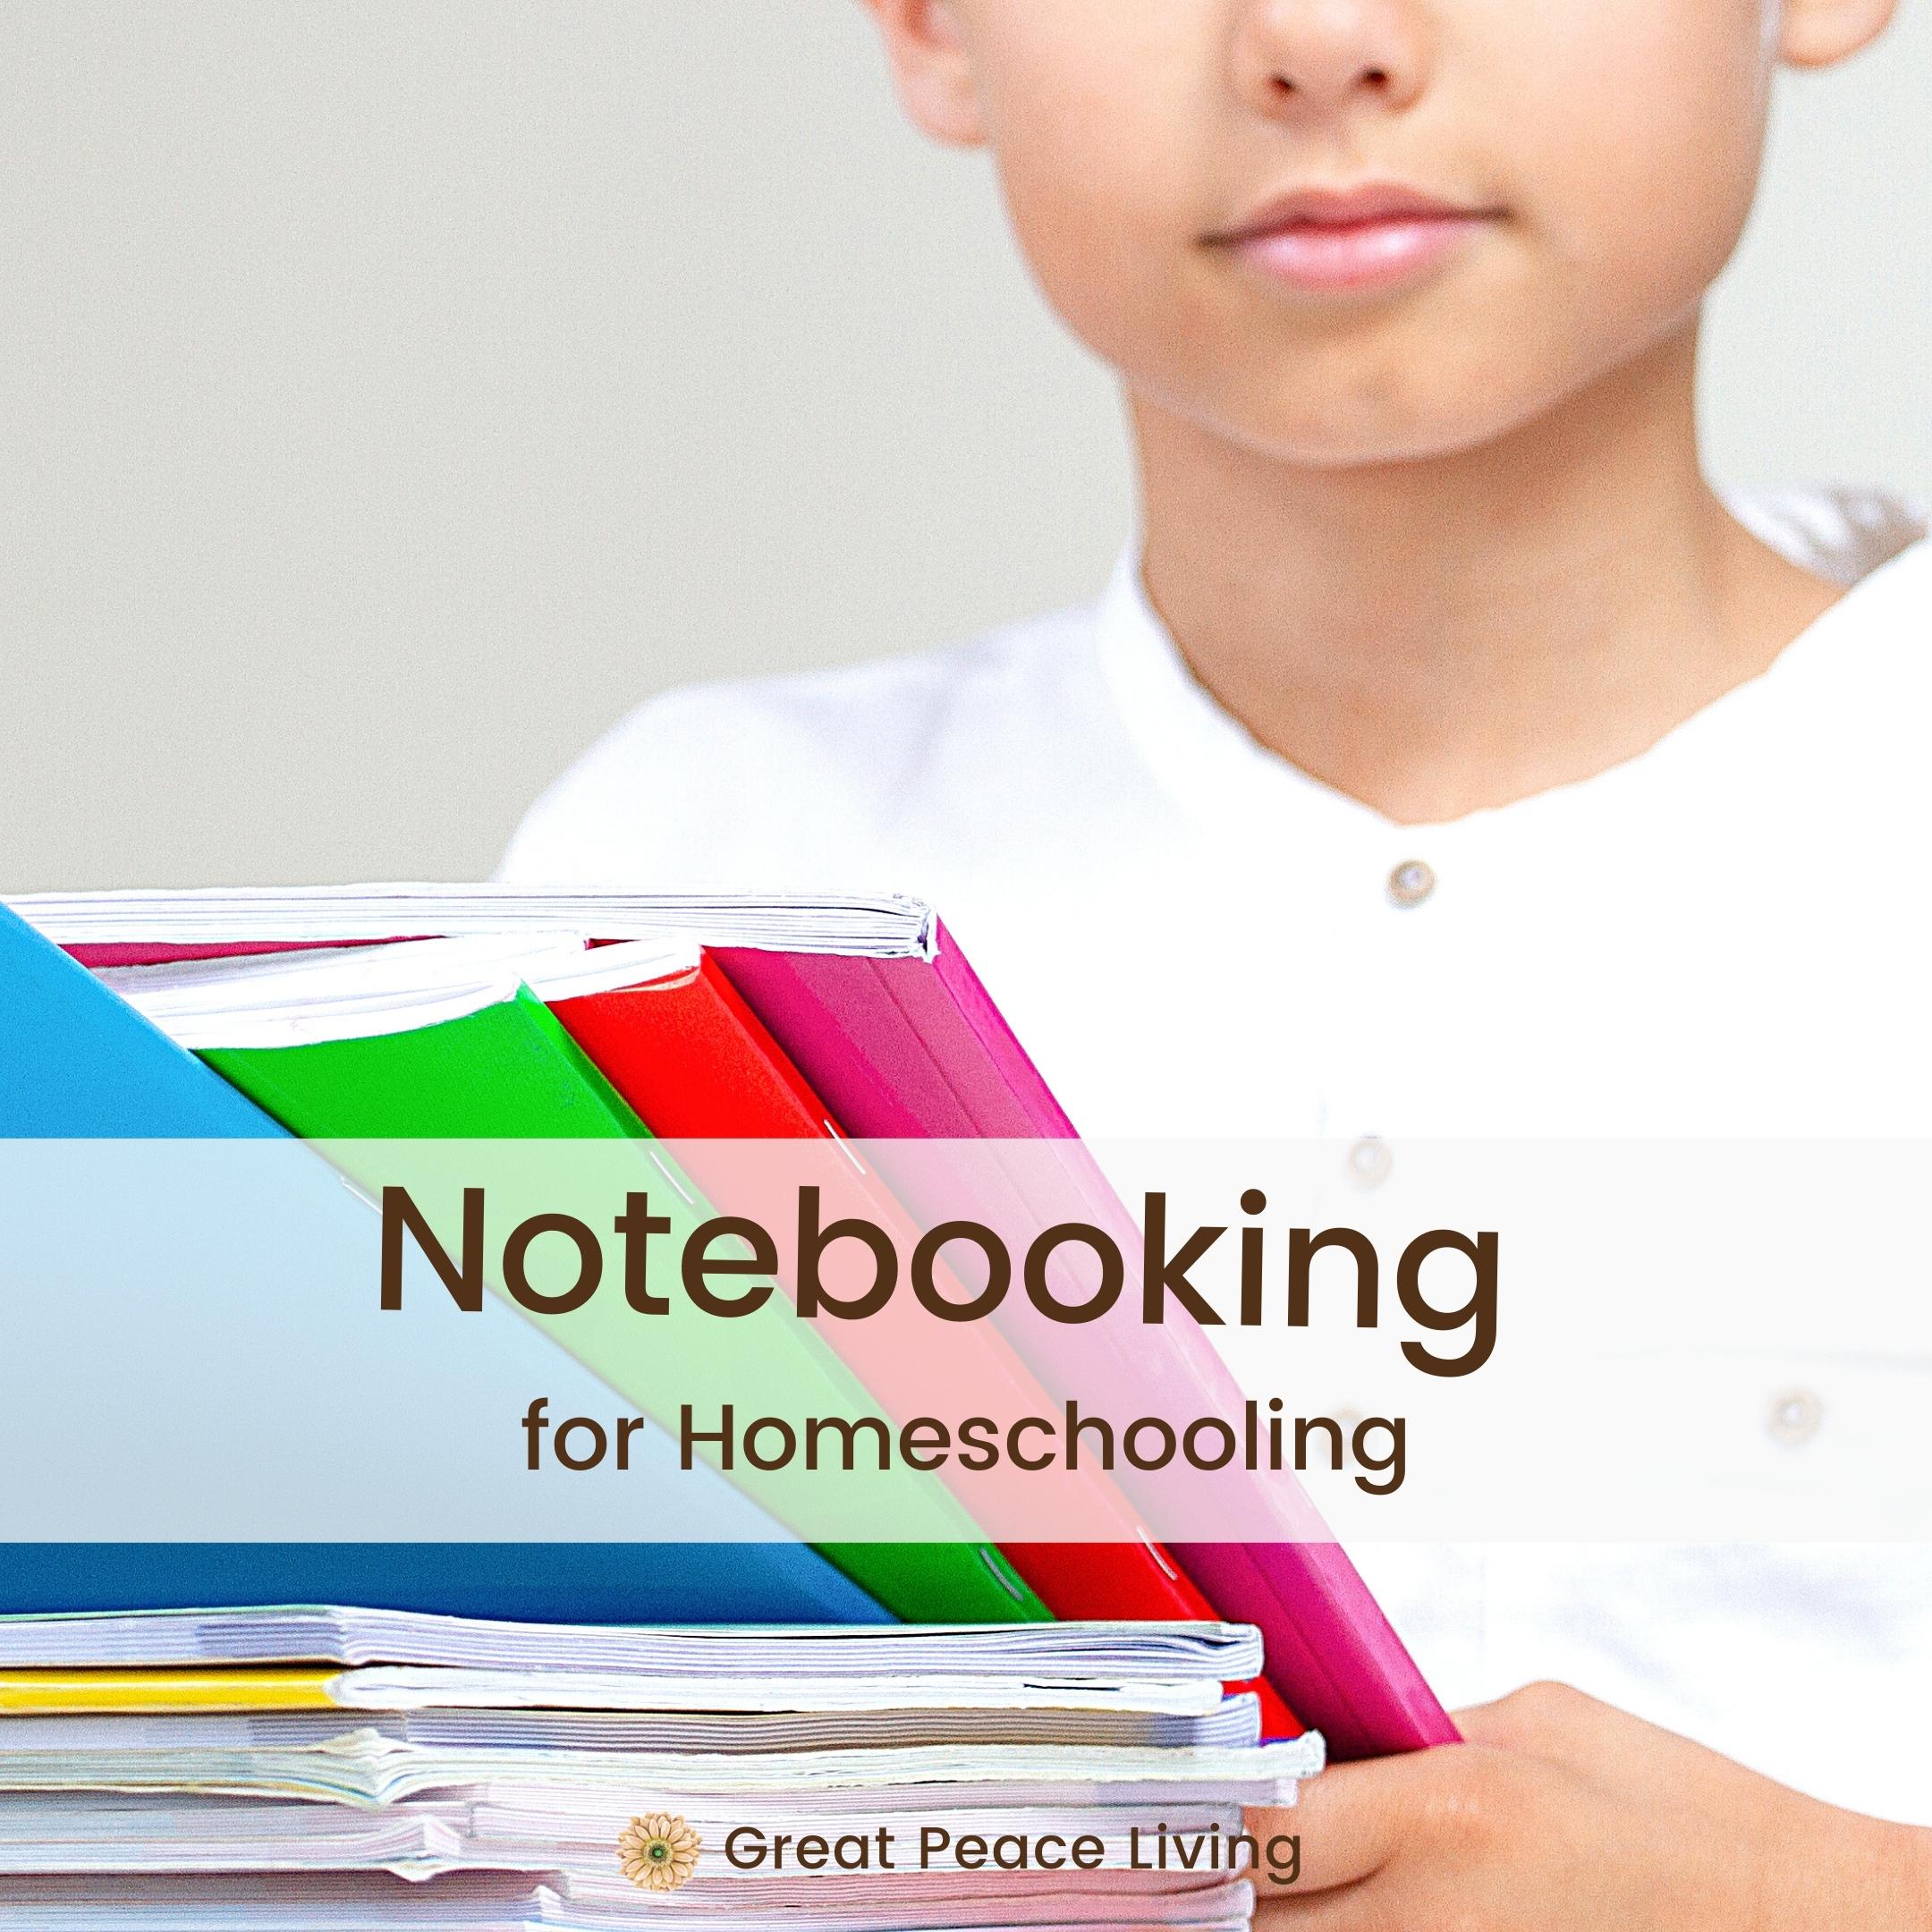 Notebooking for Homeschool